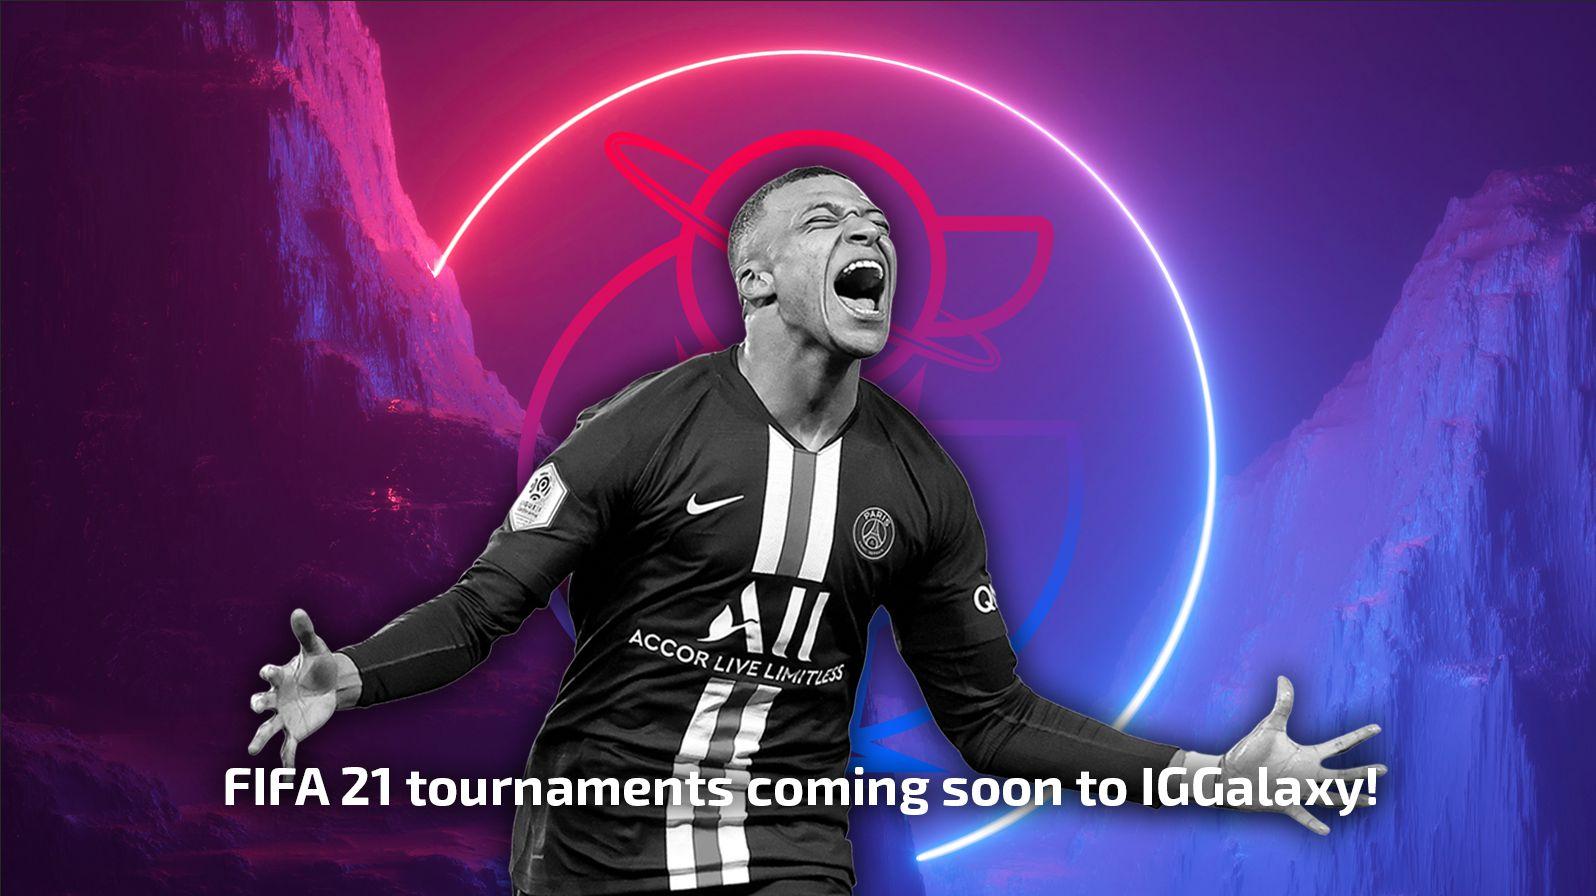 FIFA 21 tournaments available in IGGalaxy soon!